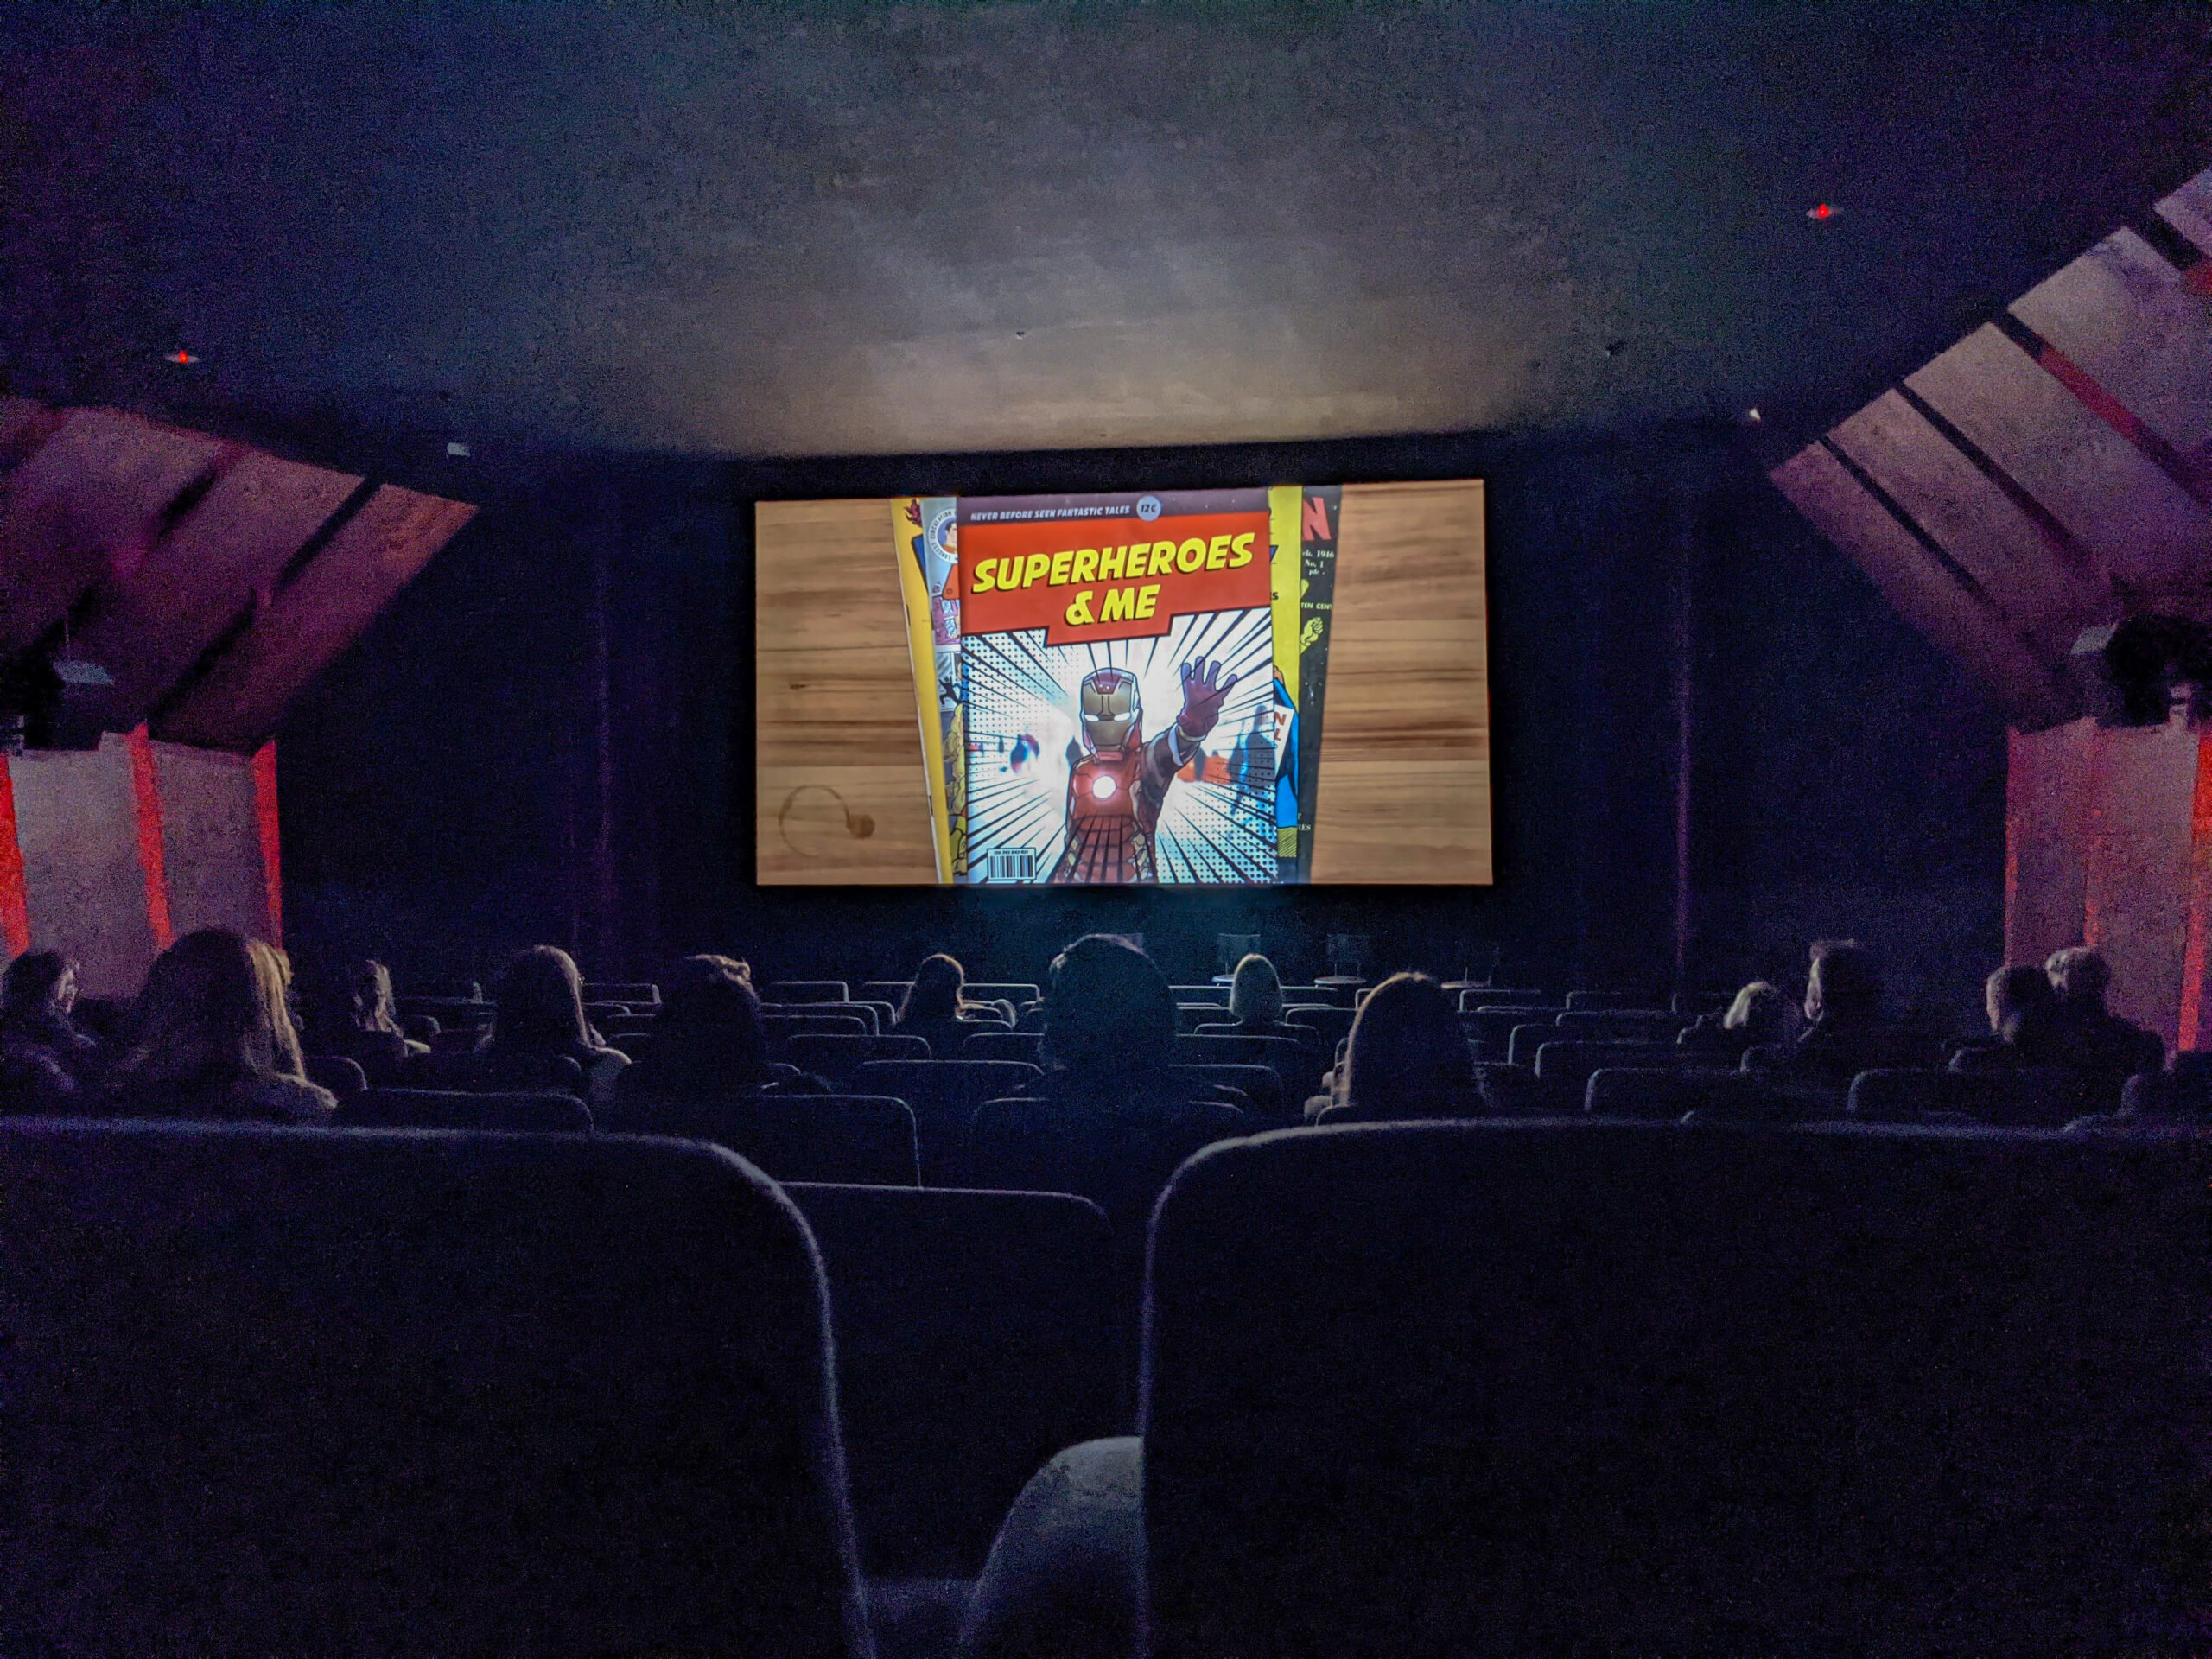 Melbourne Documentary Film festival screening Superheroes and Me